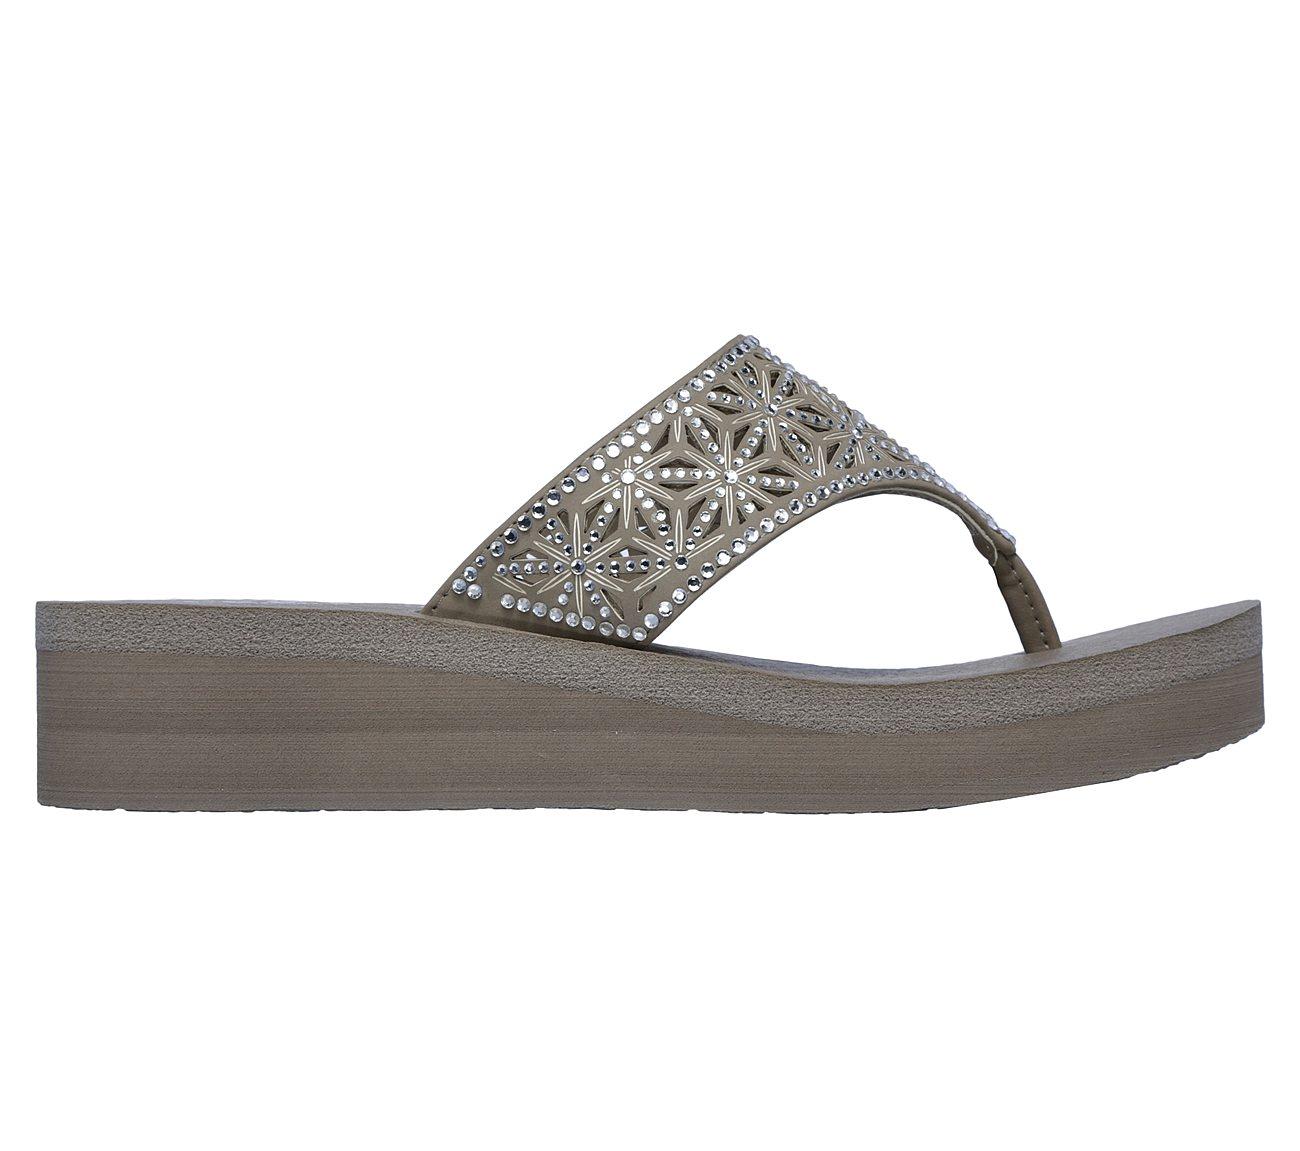 053f8085b52b Buy SKECHERS Vinyasa - Glass Star Cali Shoes only  39.00